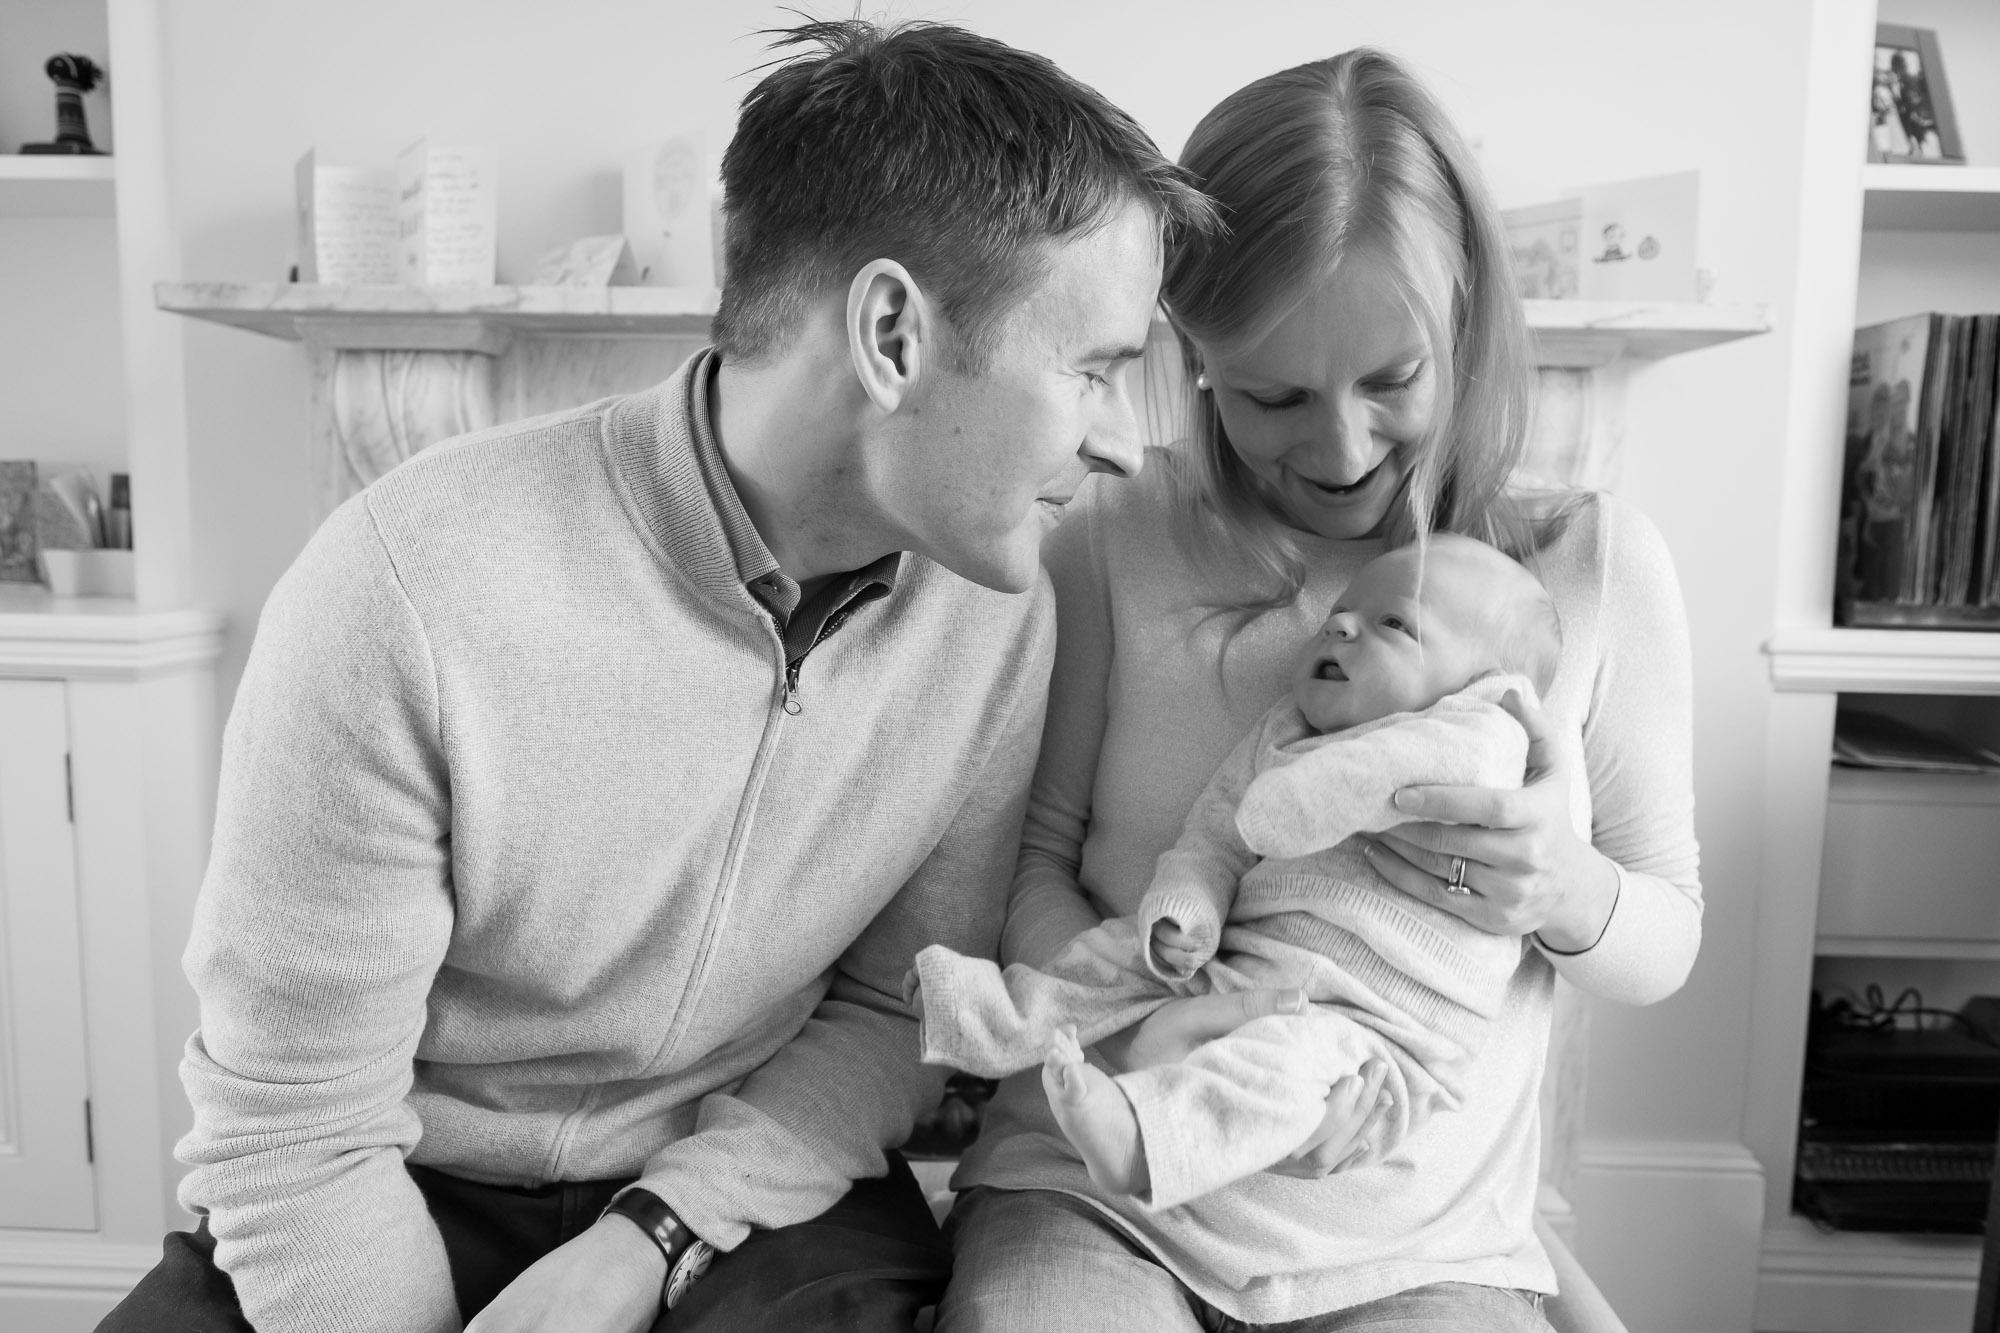 newborn-baby-family-portrait-photographer-053.jpg